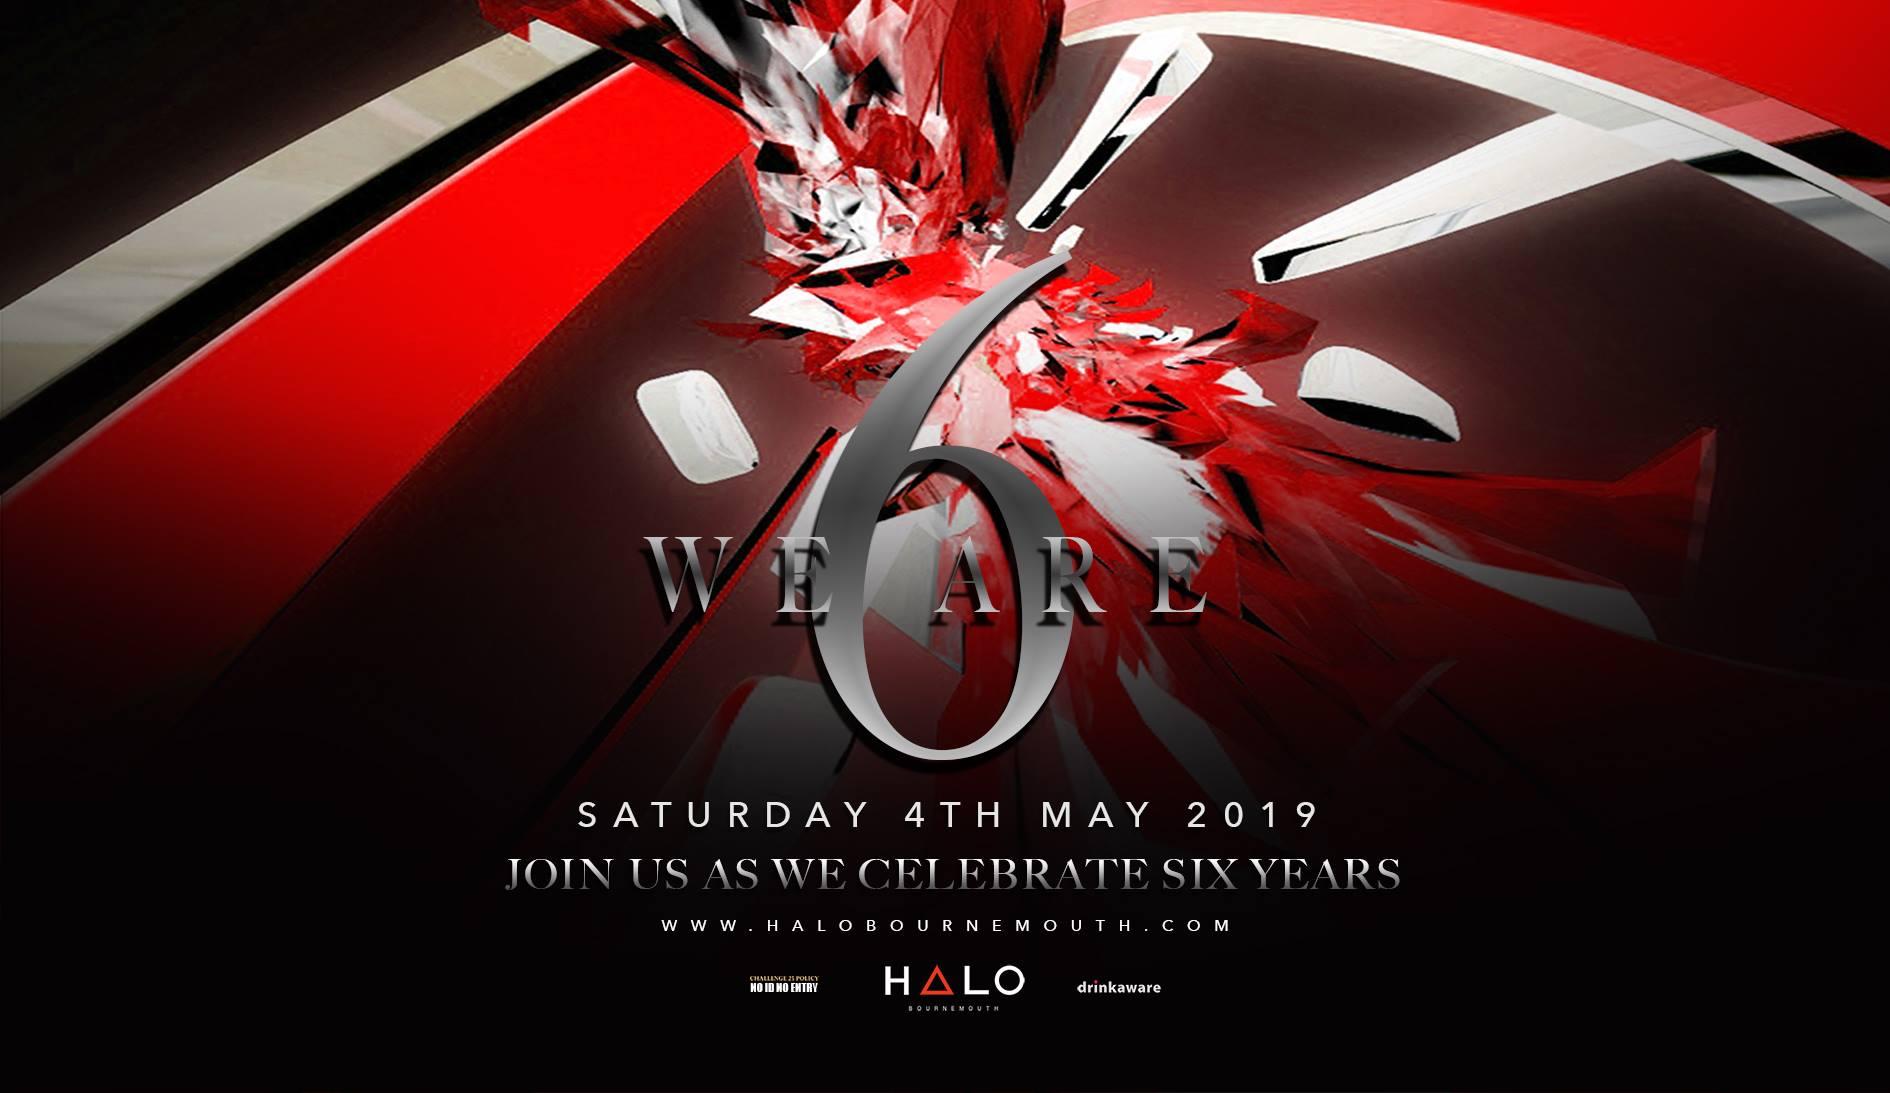 We Are Six: Halo's 6th Birthday Celebrations